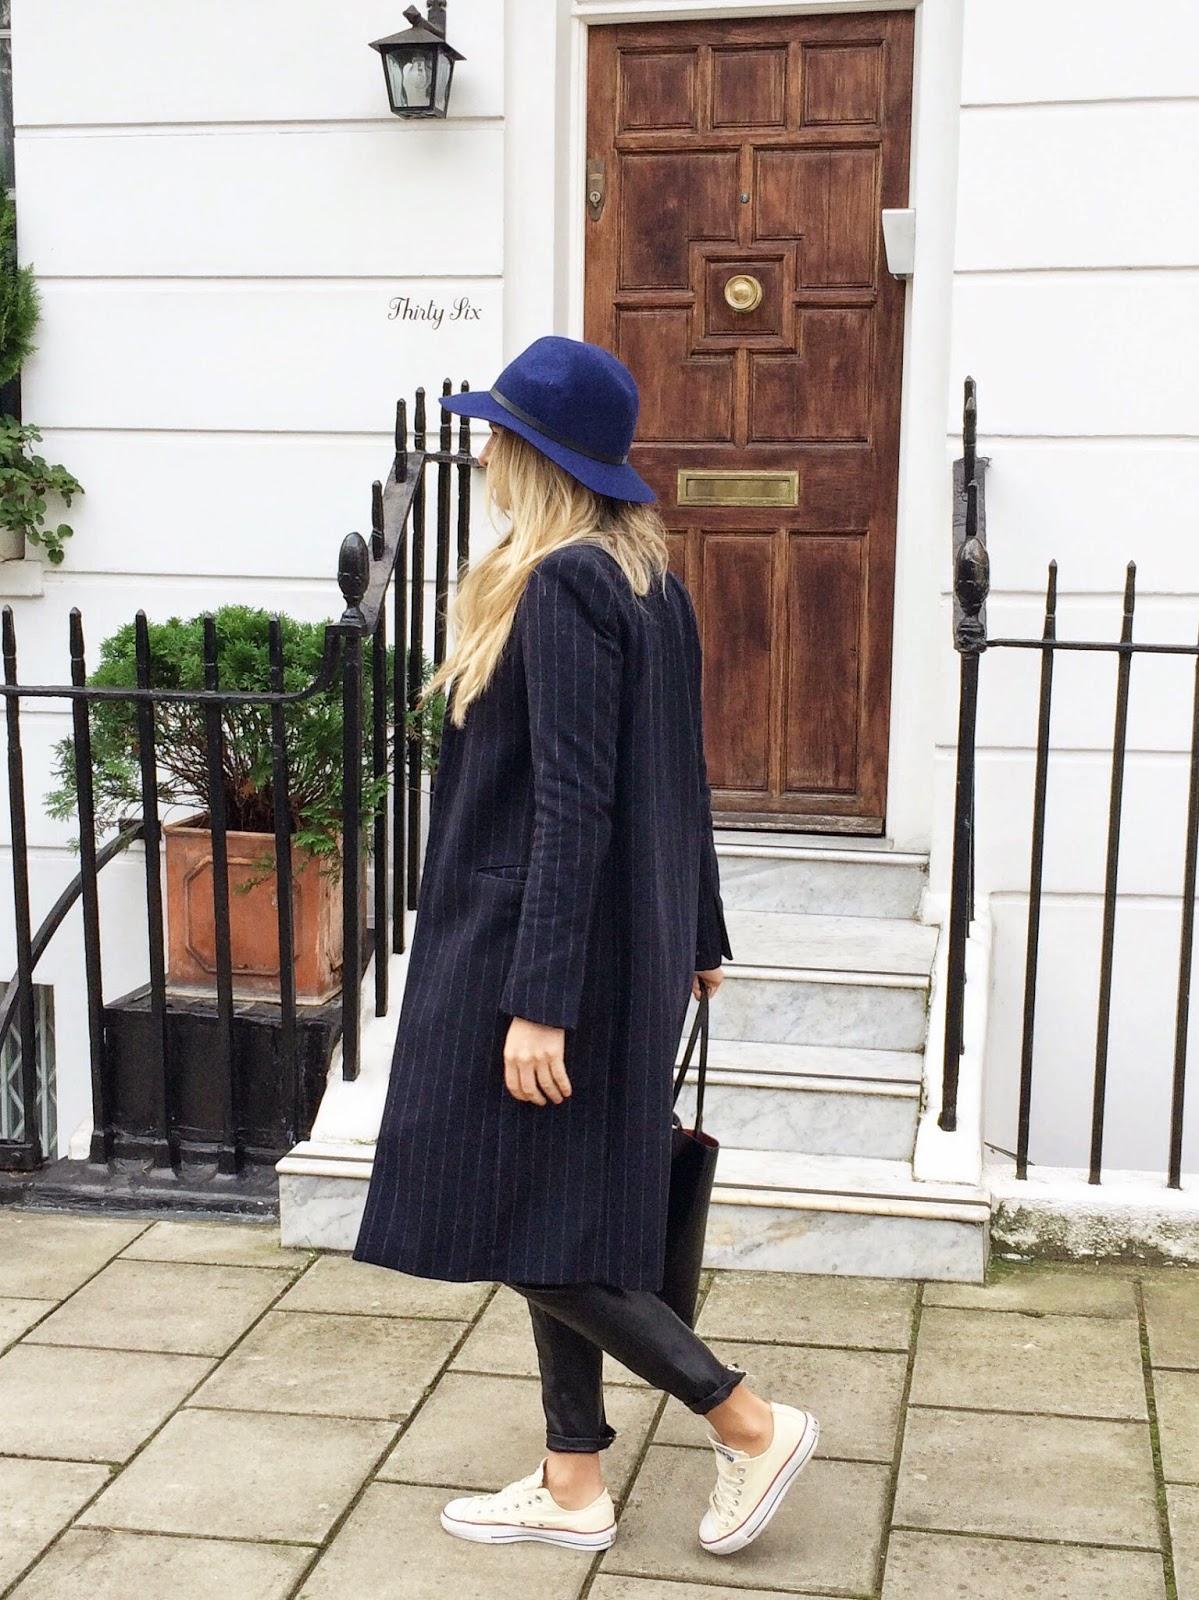 pin striped coat, blue coat, zara pinstriped coat, long blue coat, leather pants, converse, blue hat, topshop hat, london, london blogger, london street style